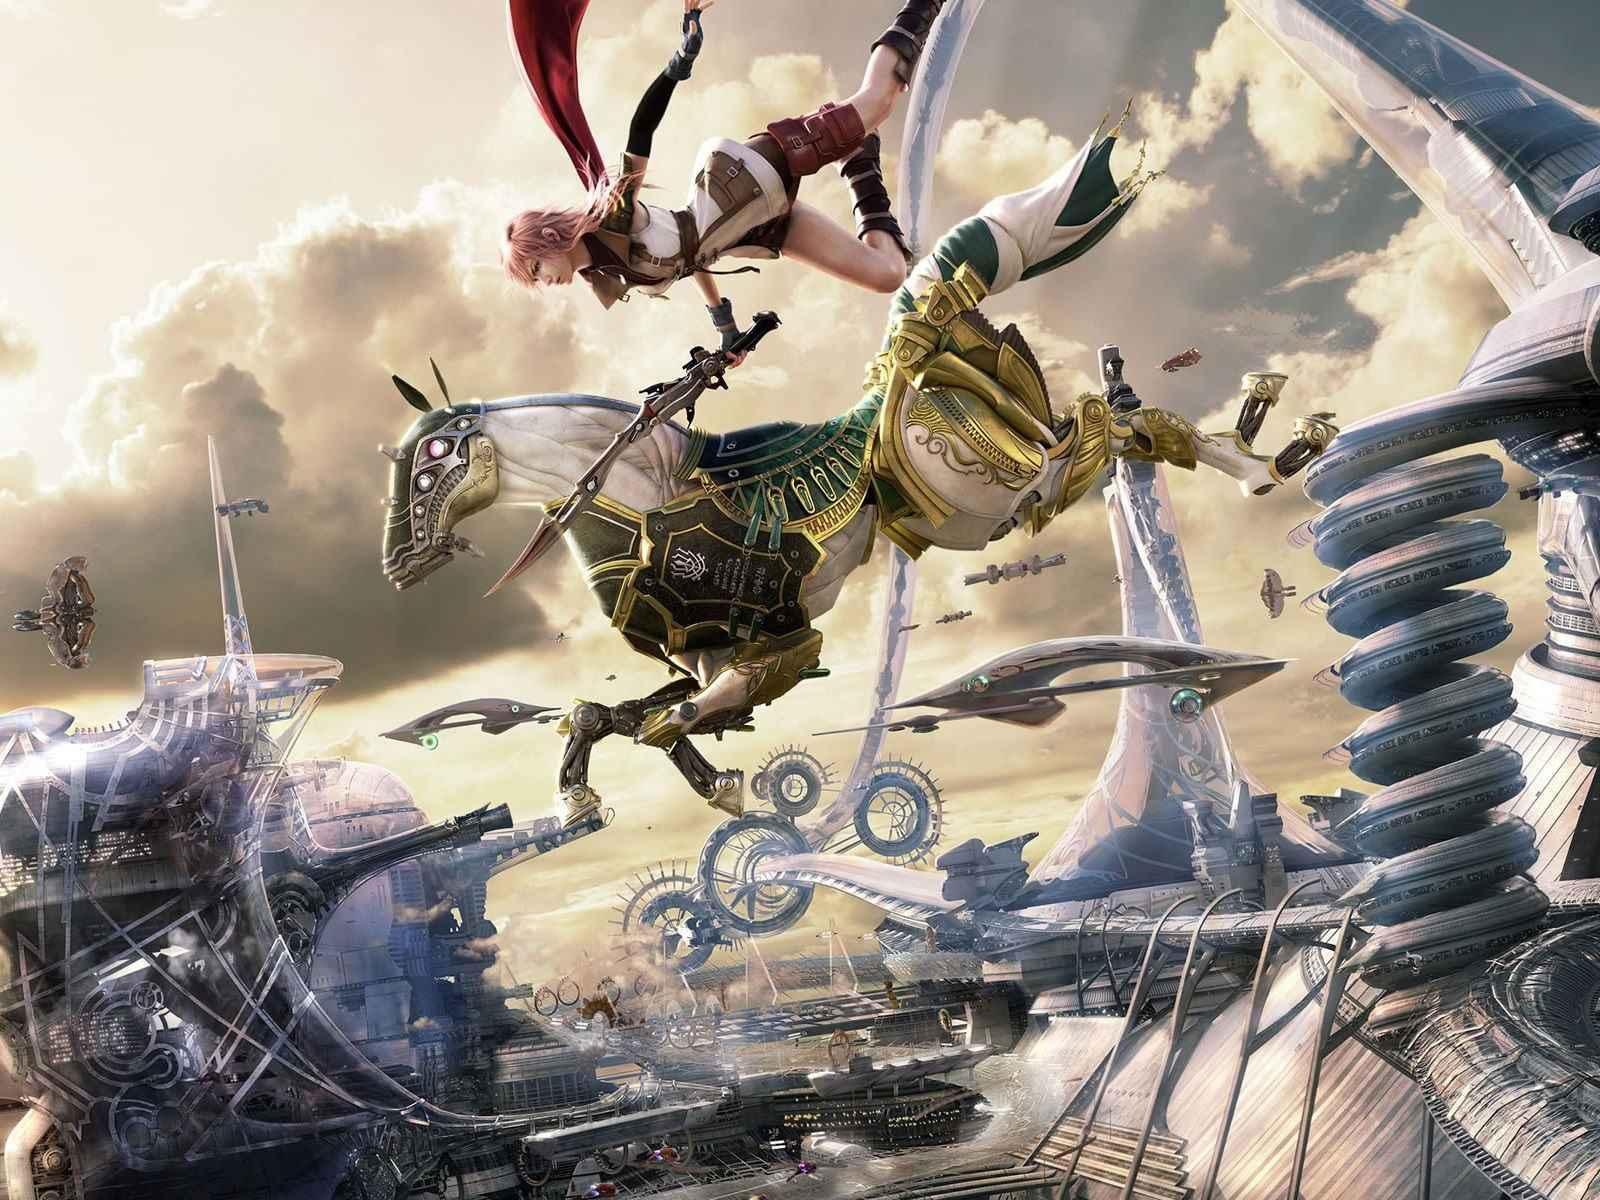 Final Fantasy Video Game Wallpaper 006